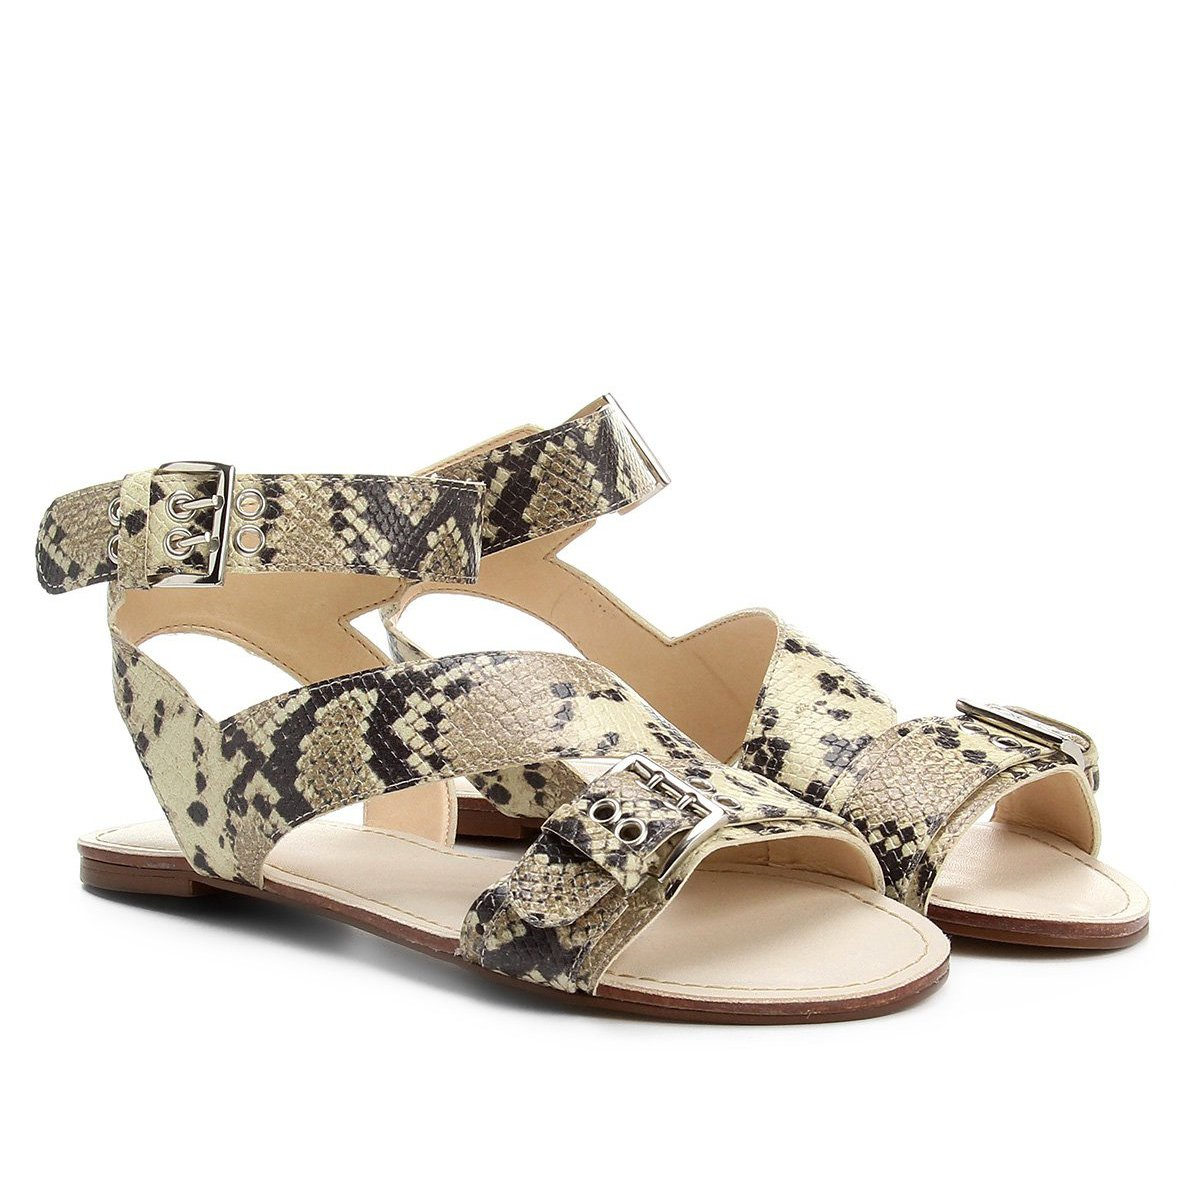 c36190682 Rasteira Couro Shoestock Croco Fivelas - Cobra | Shoestock